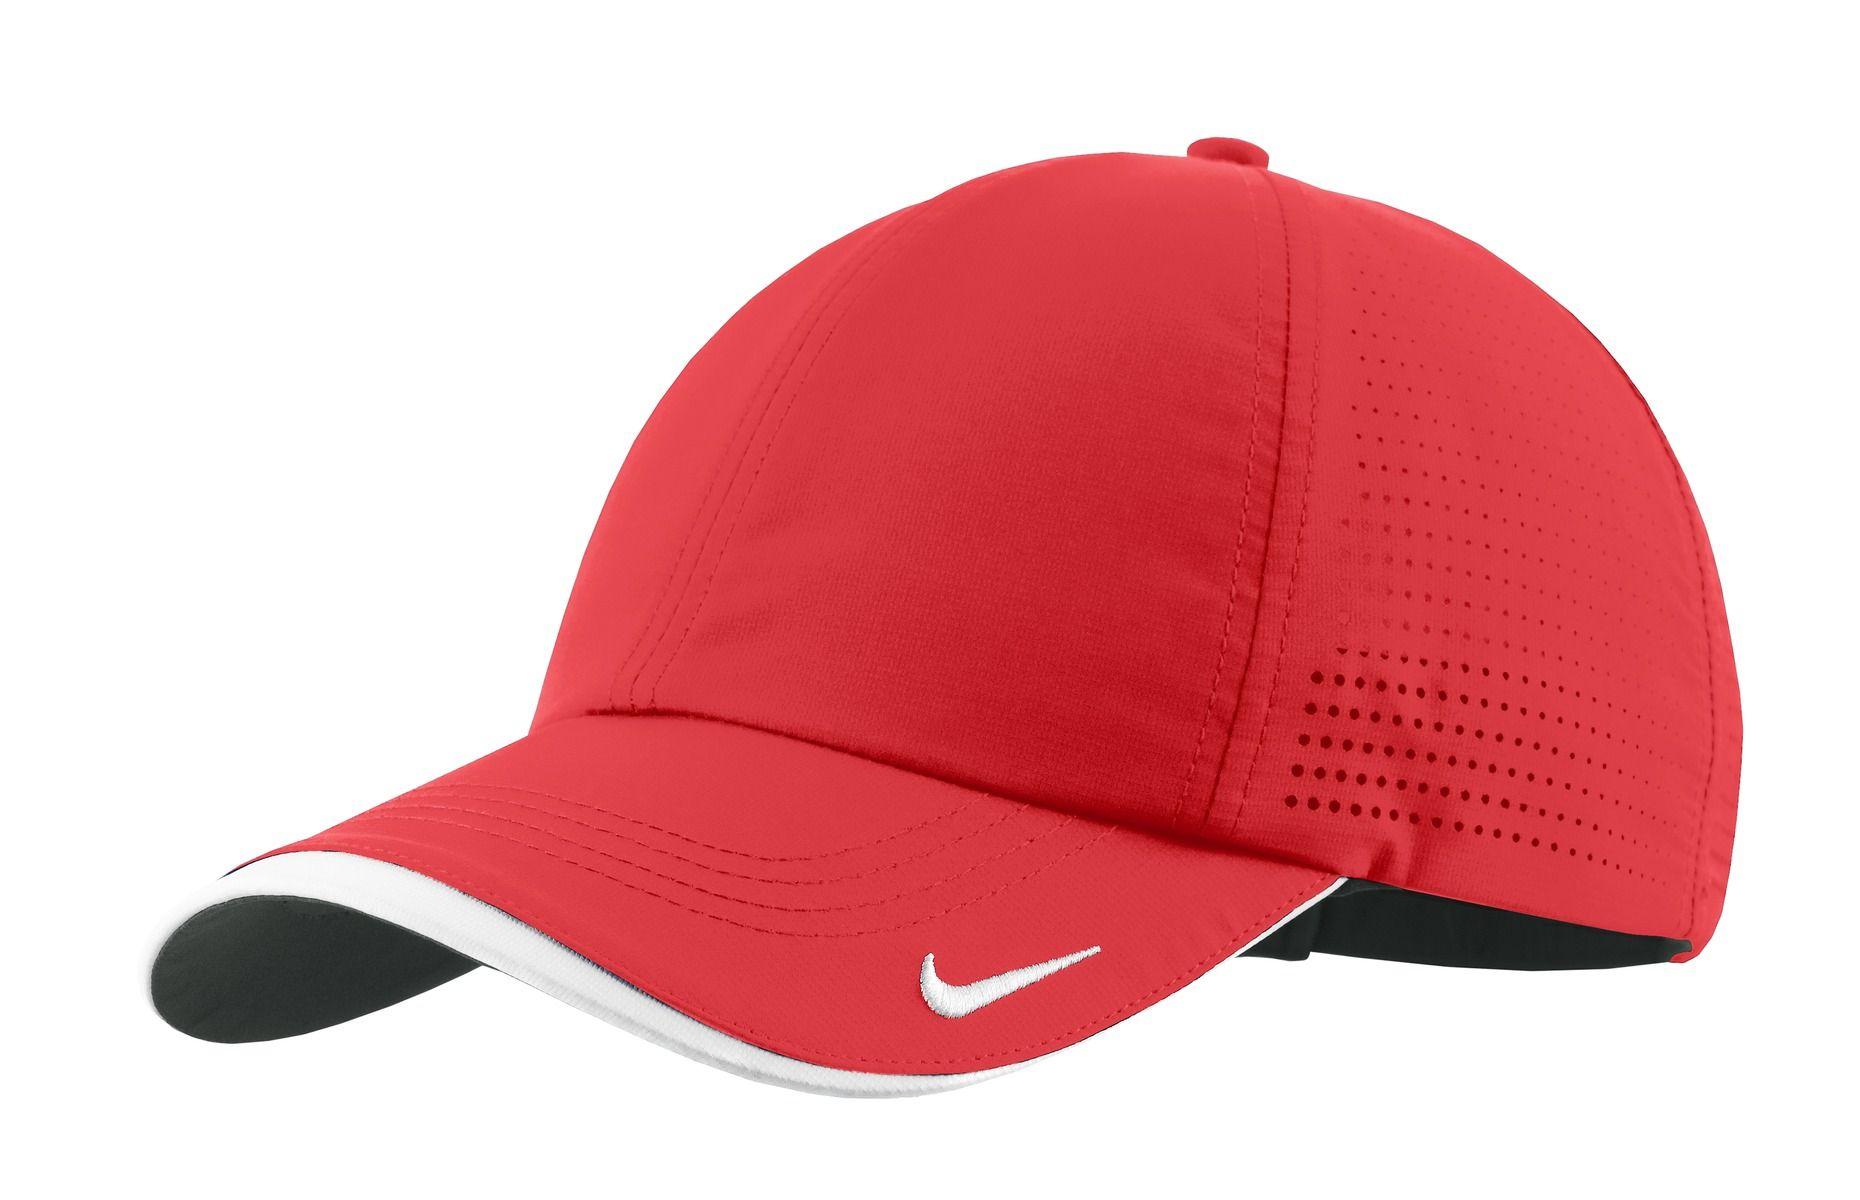 ba5a787d3 429467 Nike Golf - Dri-FIT Swoosh Perforated Cap